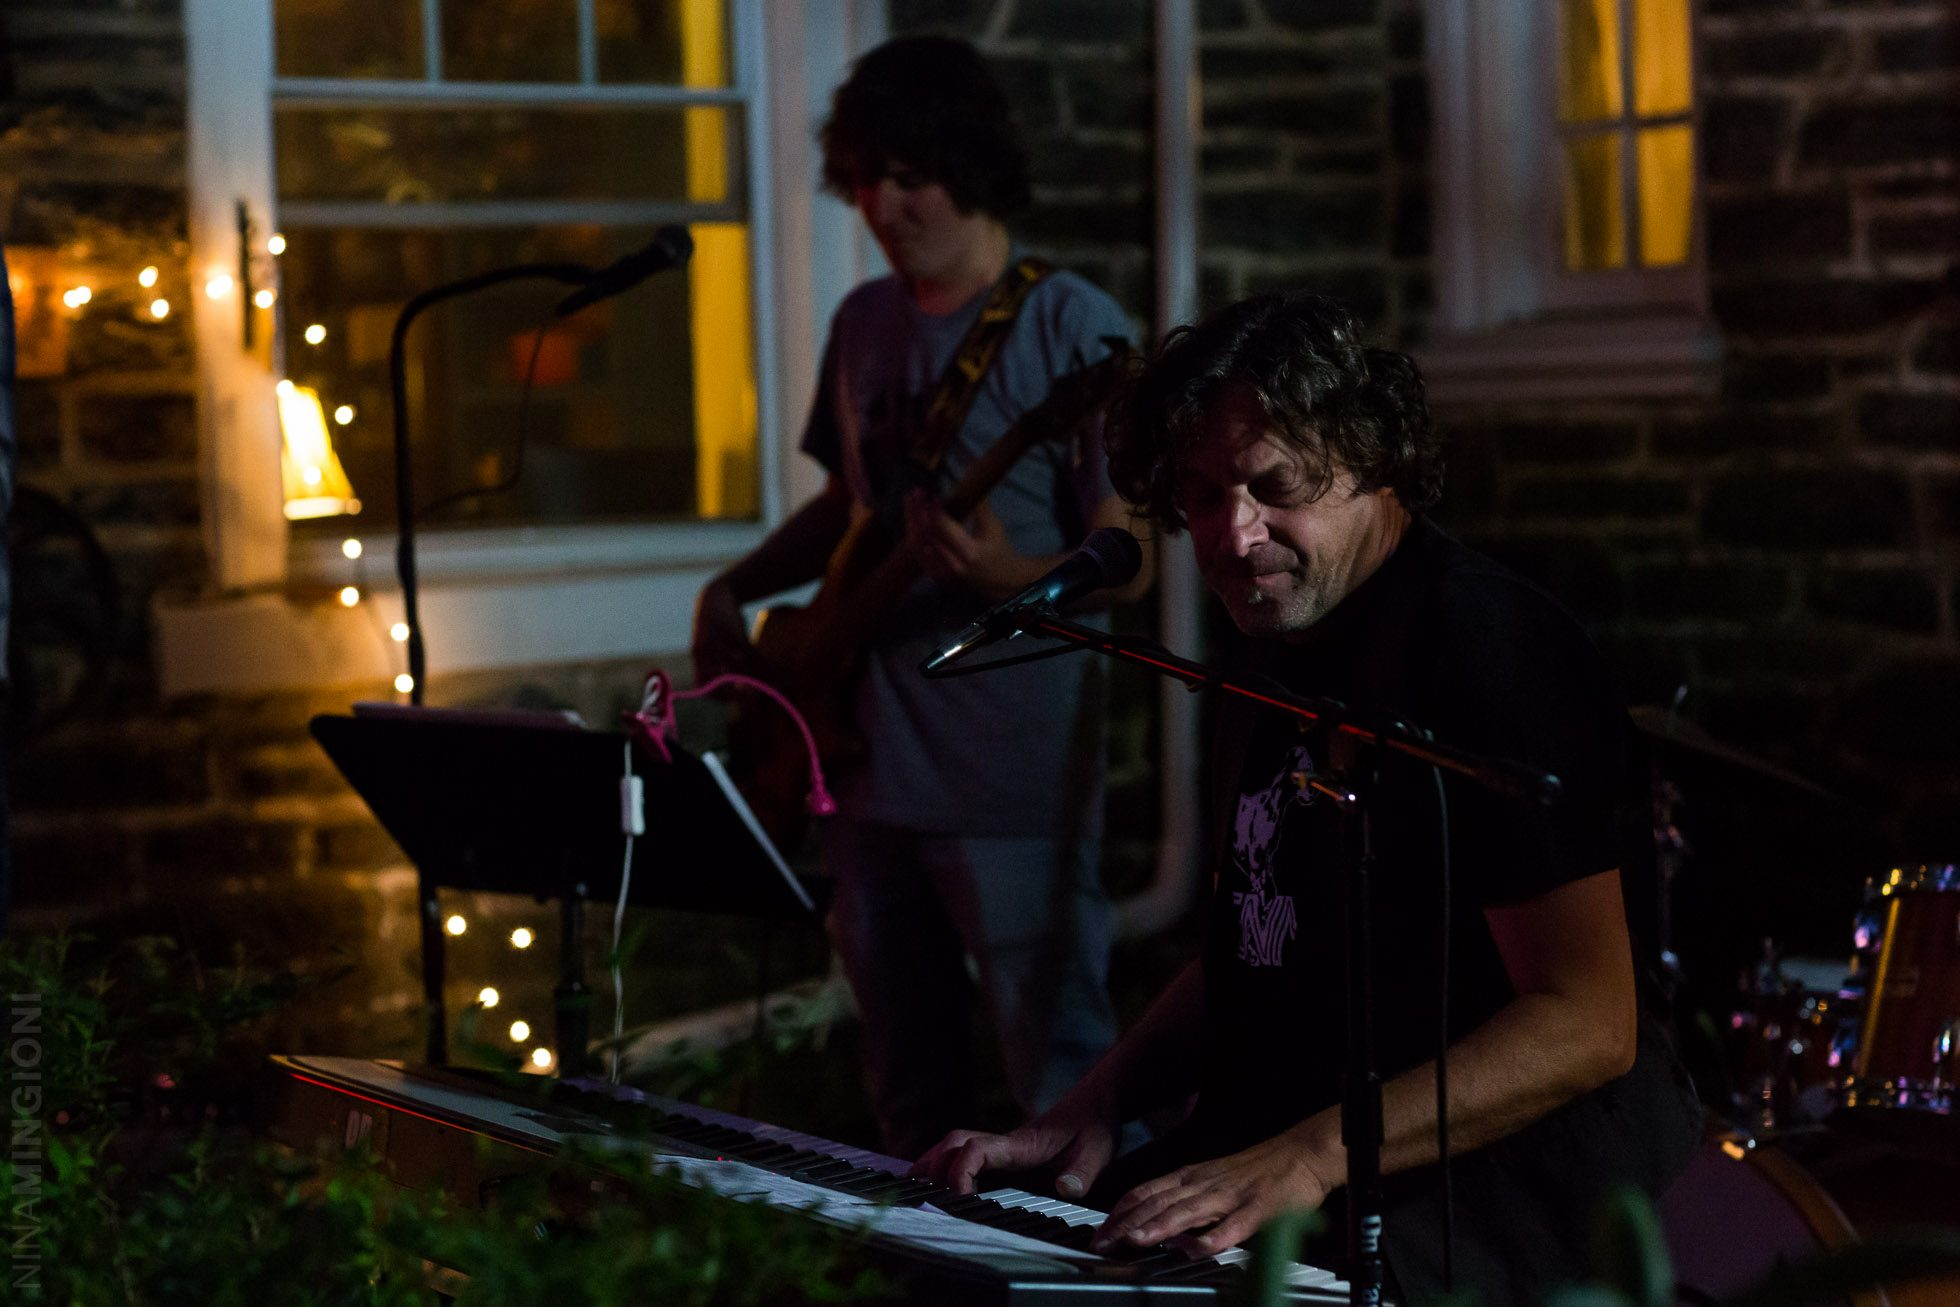 backyard concert by nina mingioni